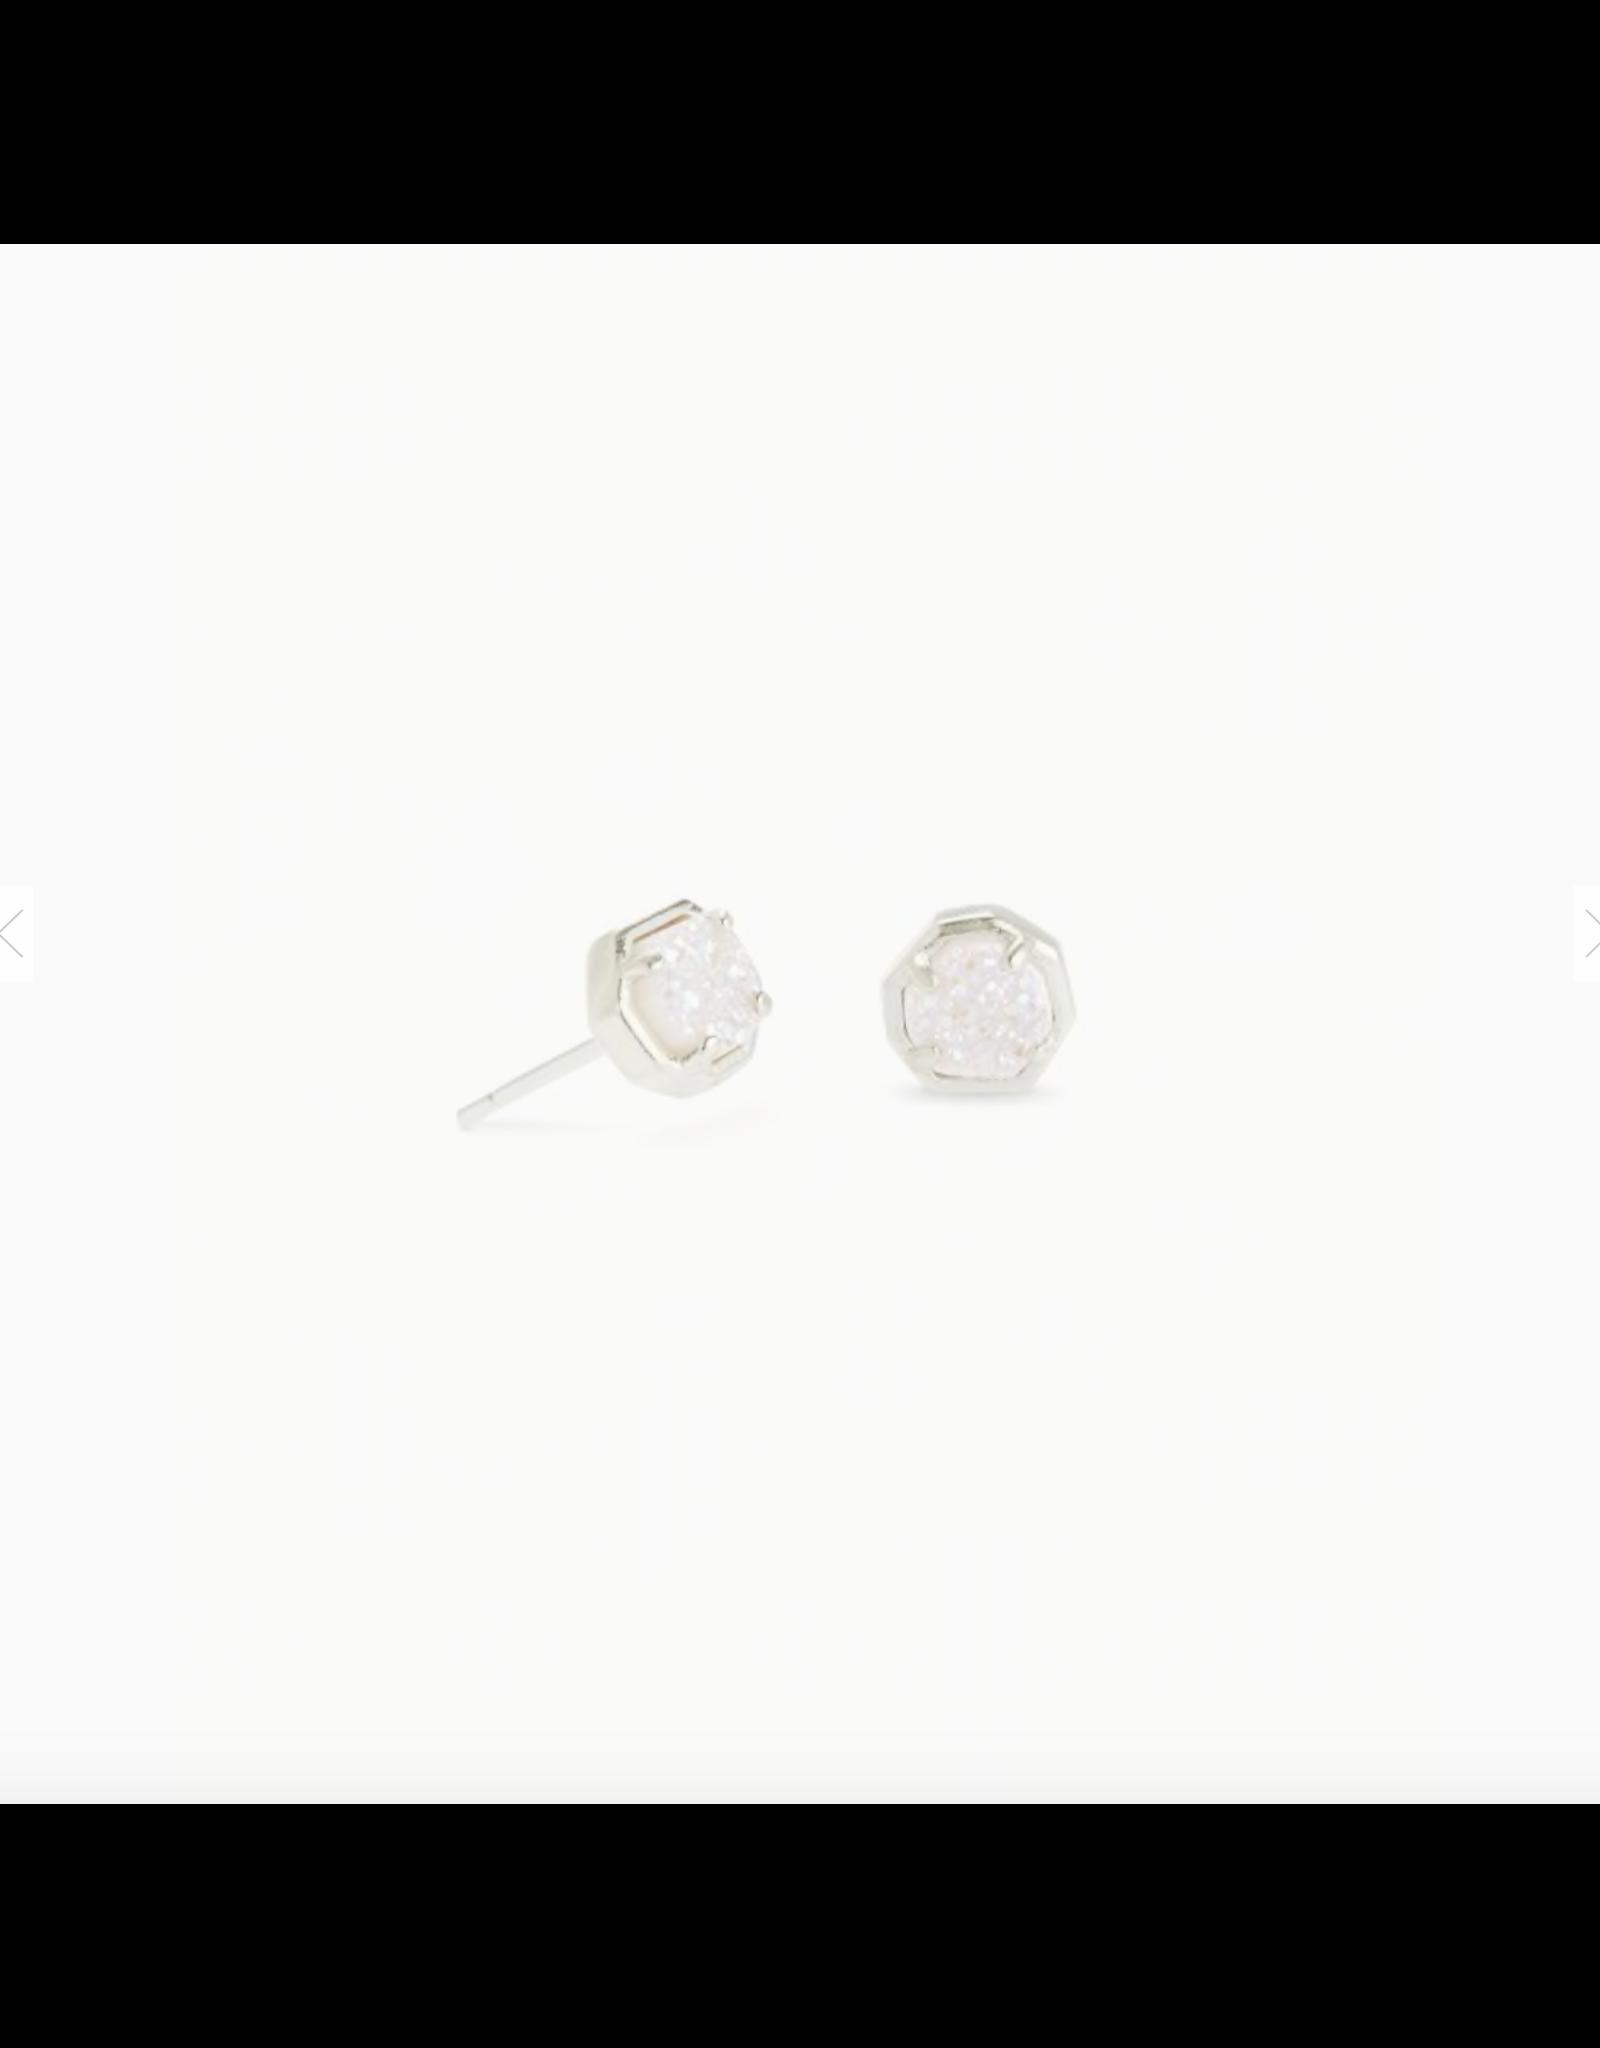 Kendra Scott Earring Nola Stud RHOD Iridescent Drusy